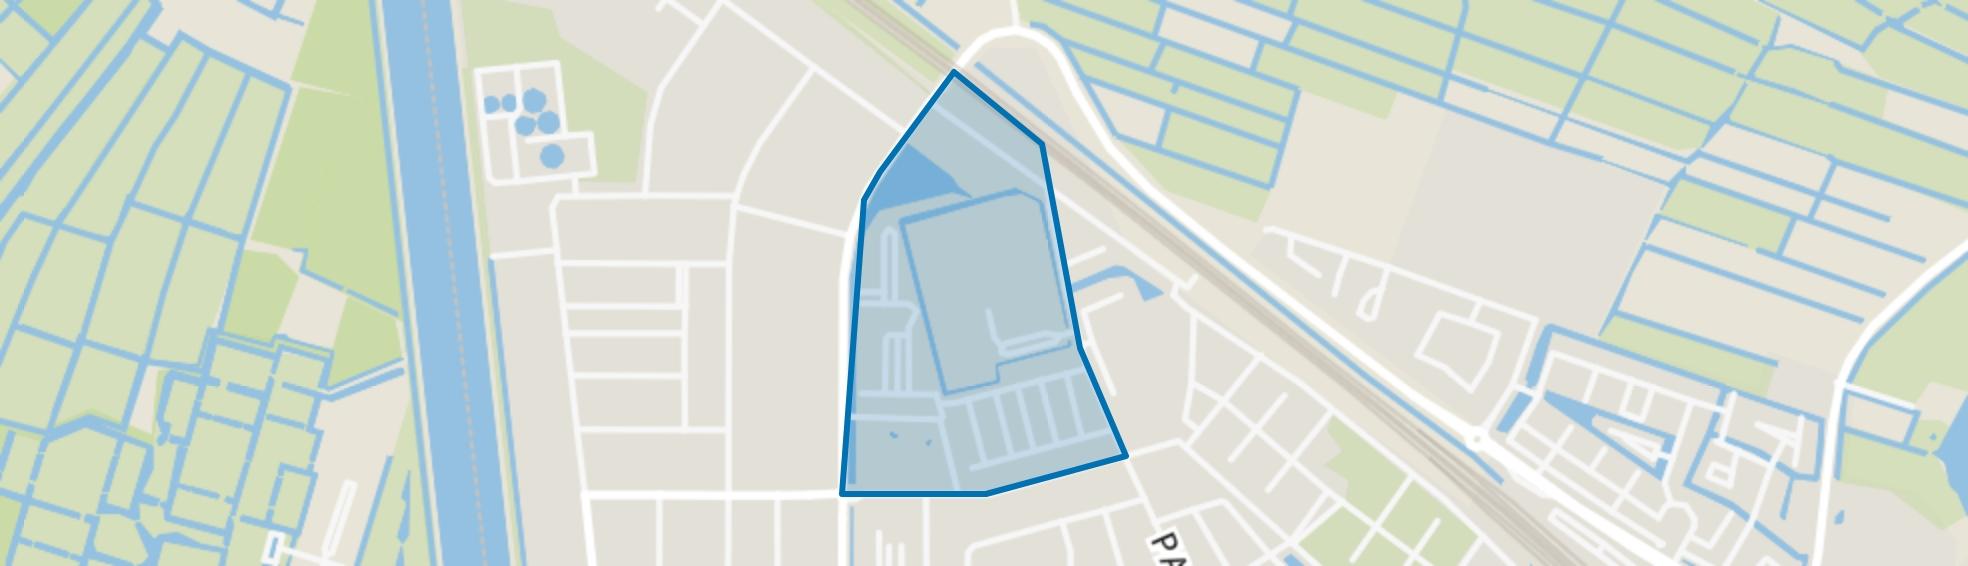 Hogewey Noord, Weesp map